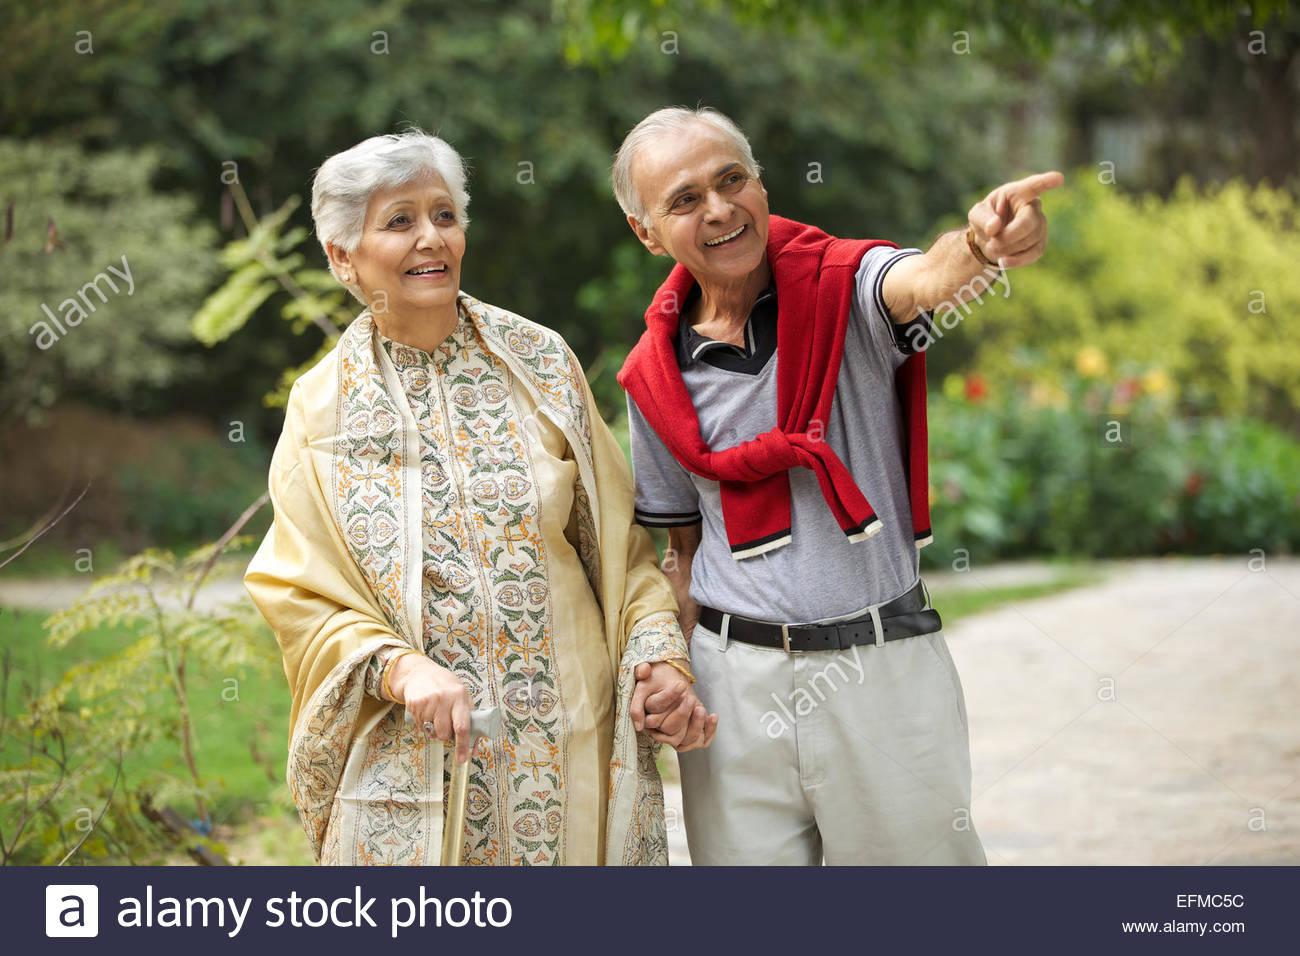 Older Couple Walking Gallery